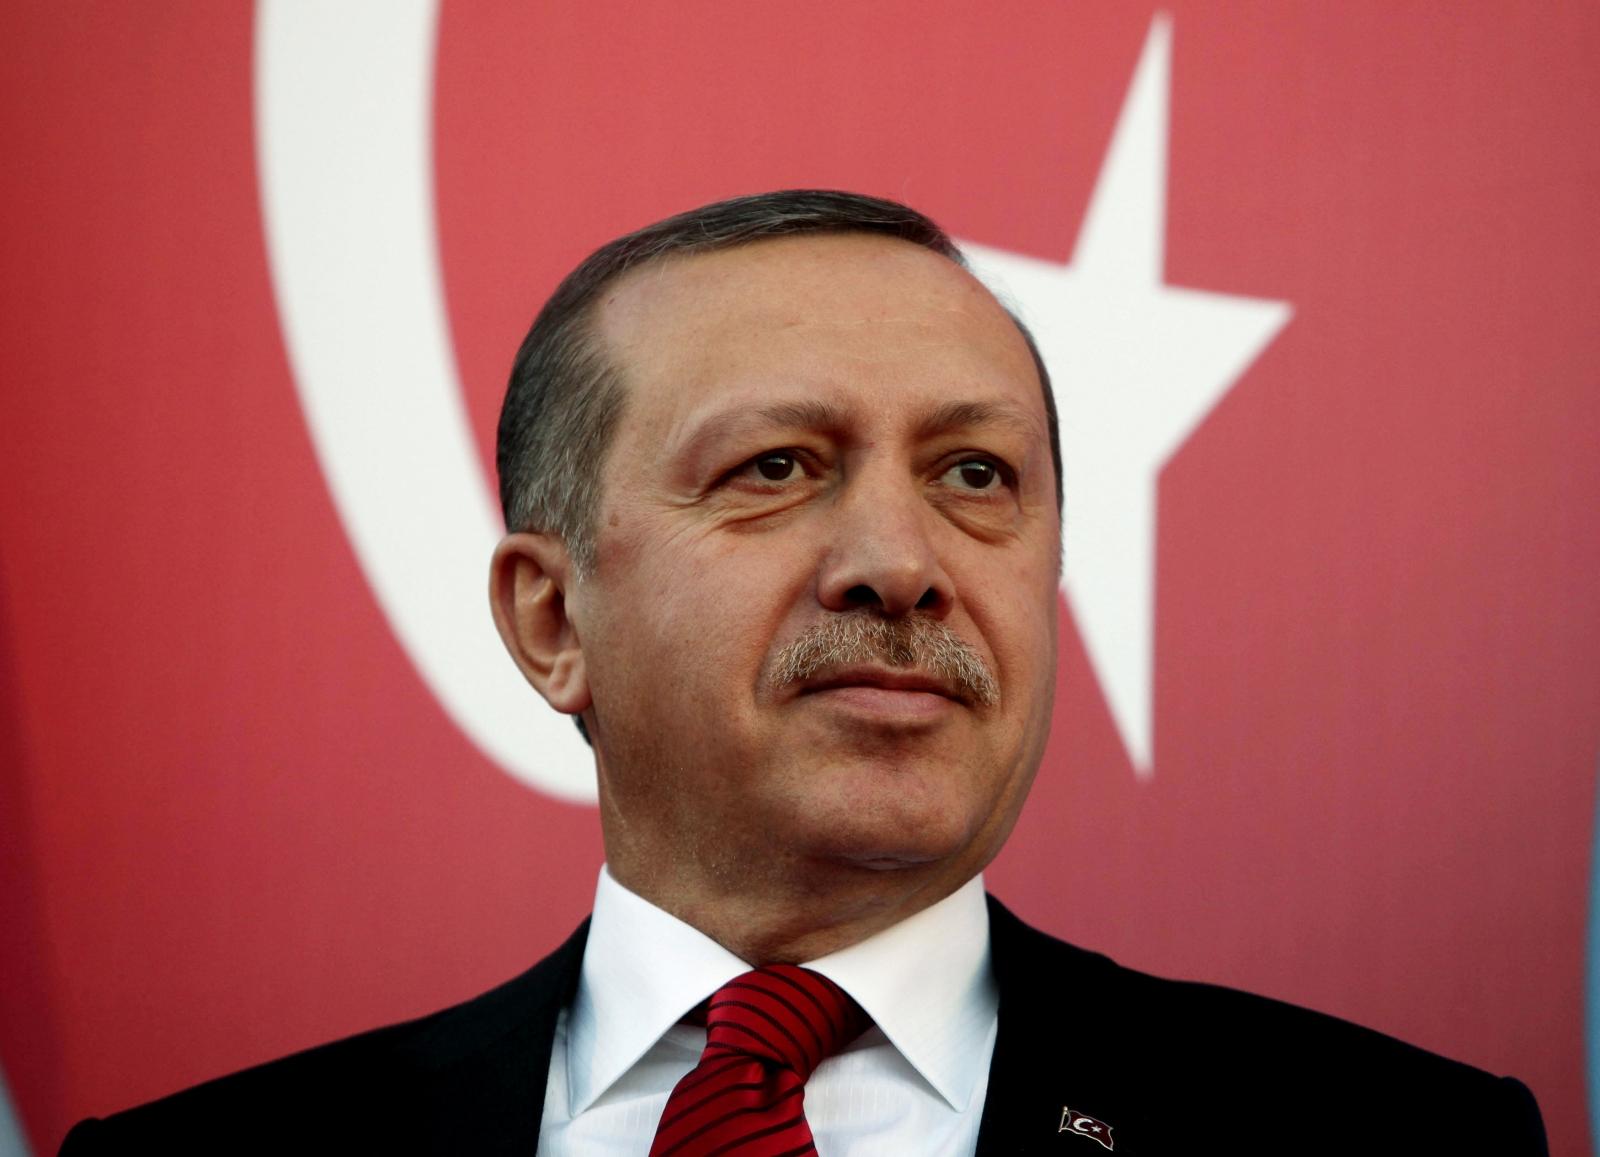 Recap Tayyip Erdogan